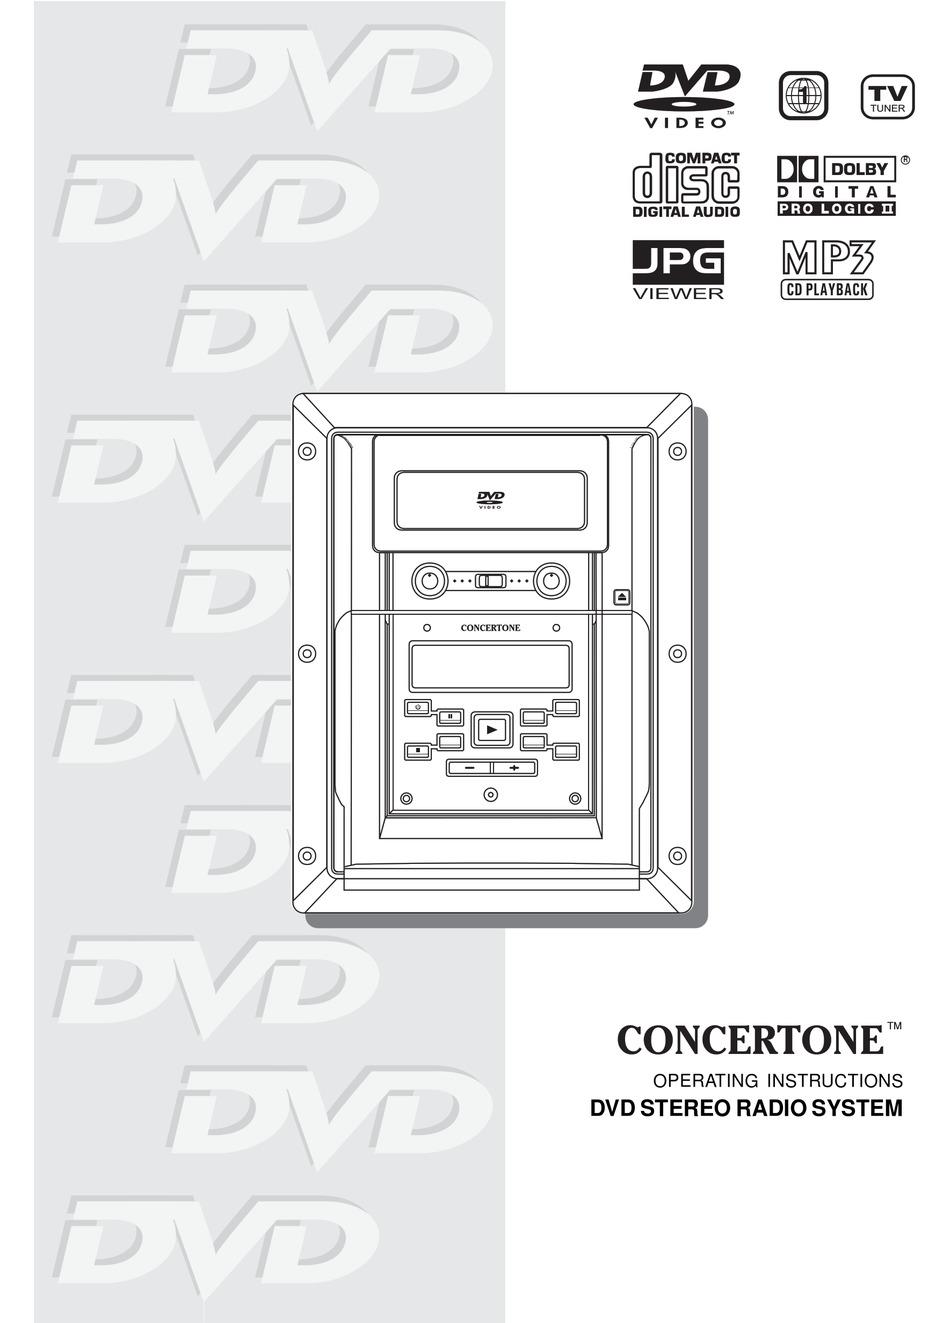 CONCERTONE DVD STEREO RADIO SYSTEM OPERATING INSTRUCTIONS MANUAL Pdf  Download   ManualsLib   Concertone Wiring Diagram      ManualsLib